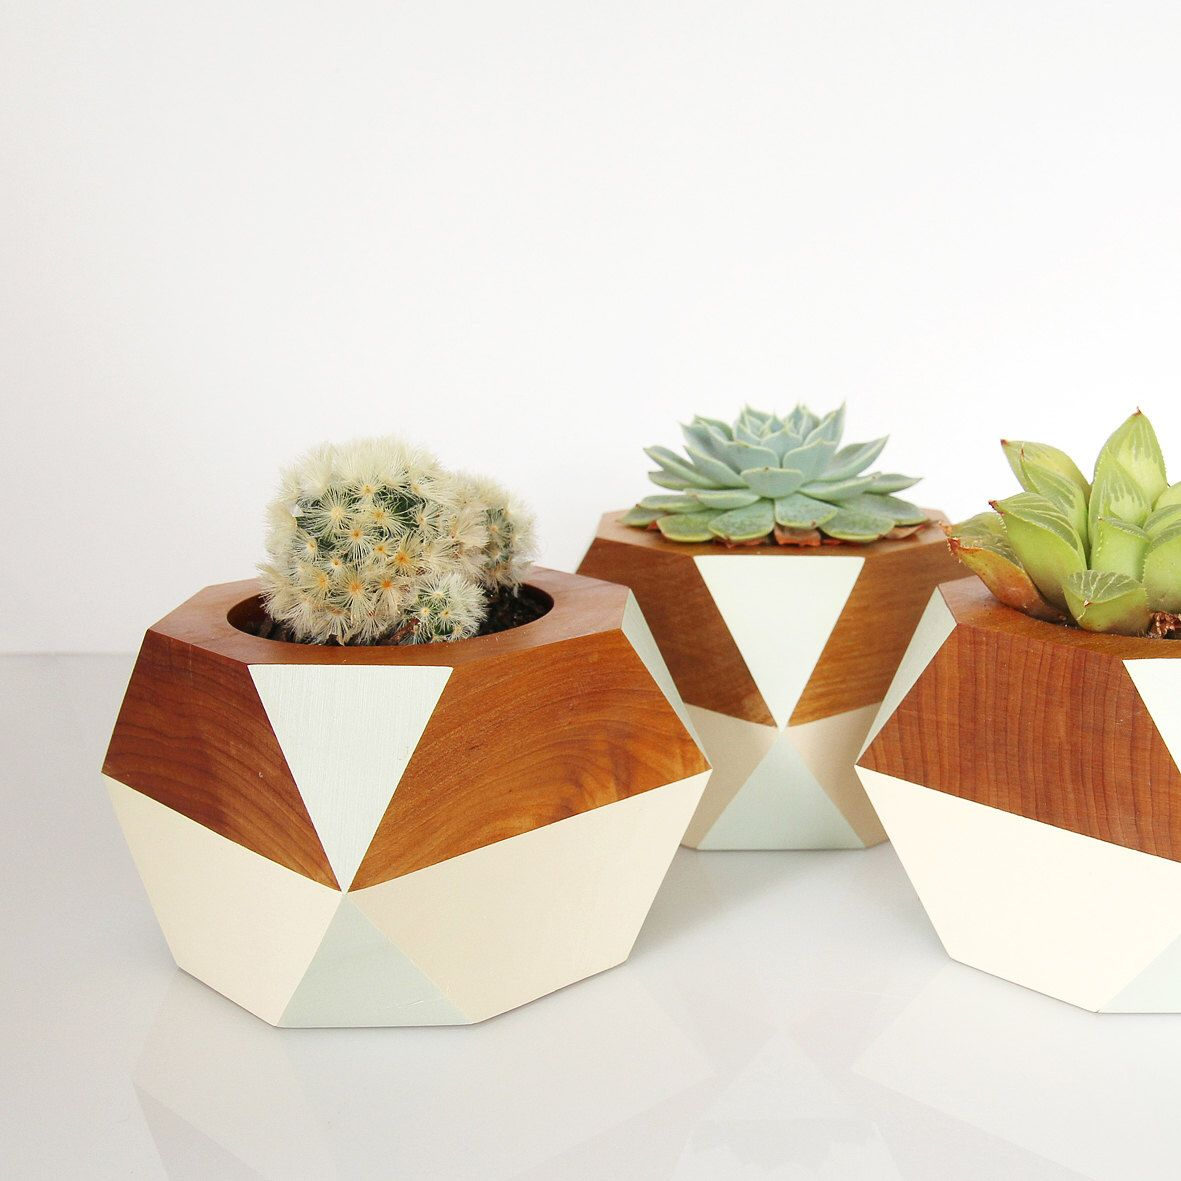 Geometric Wooden Pot — Pale Green by GwynethHulseDesign on Etsy https://www.etsy.com/listing/170305503/geometric-wooden-pot-pale-green